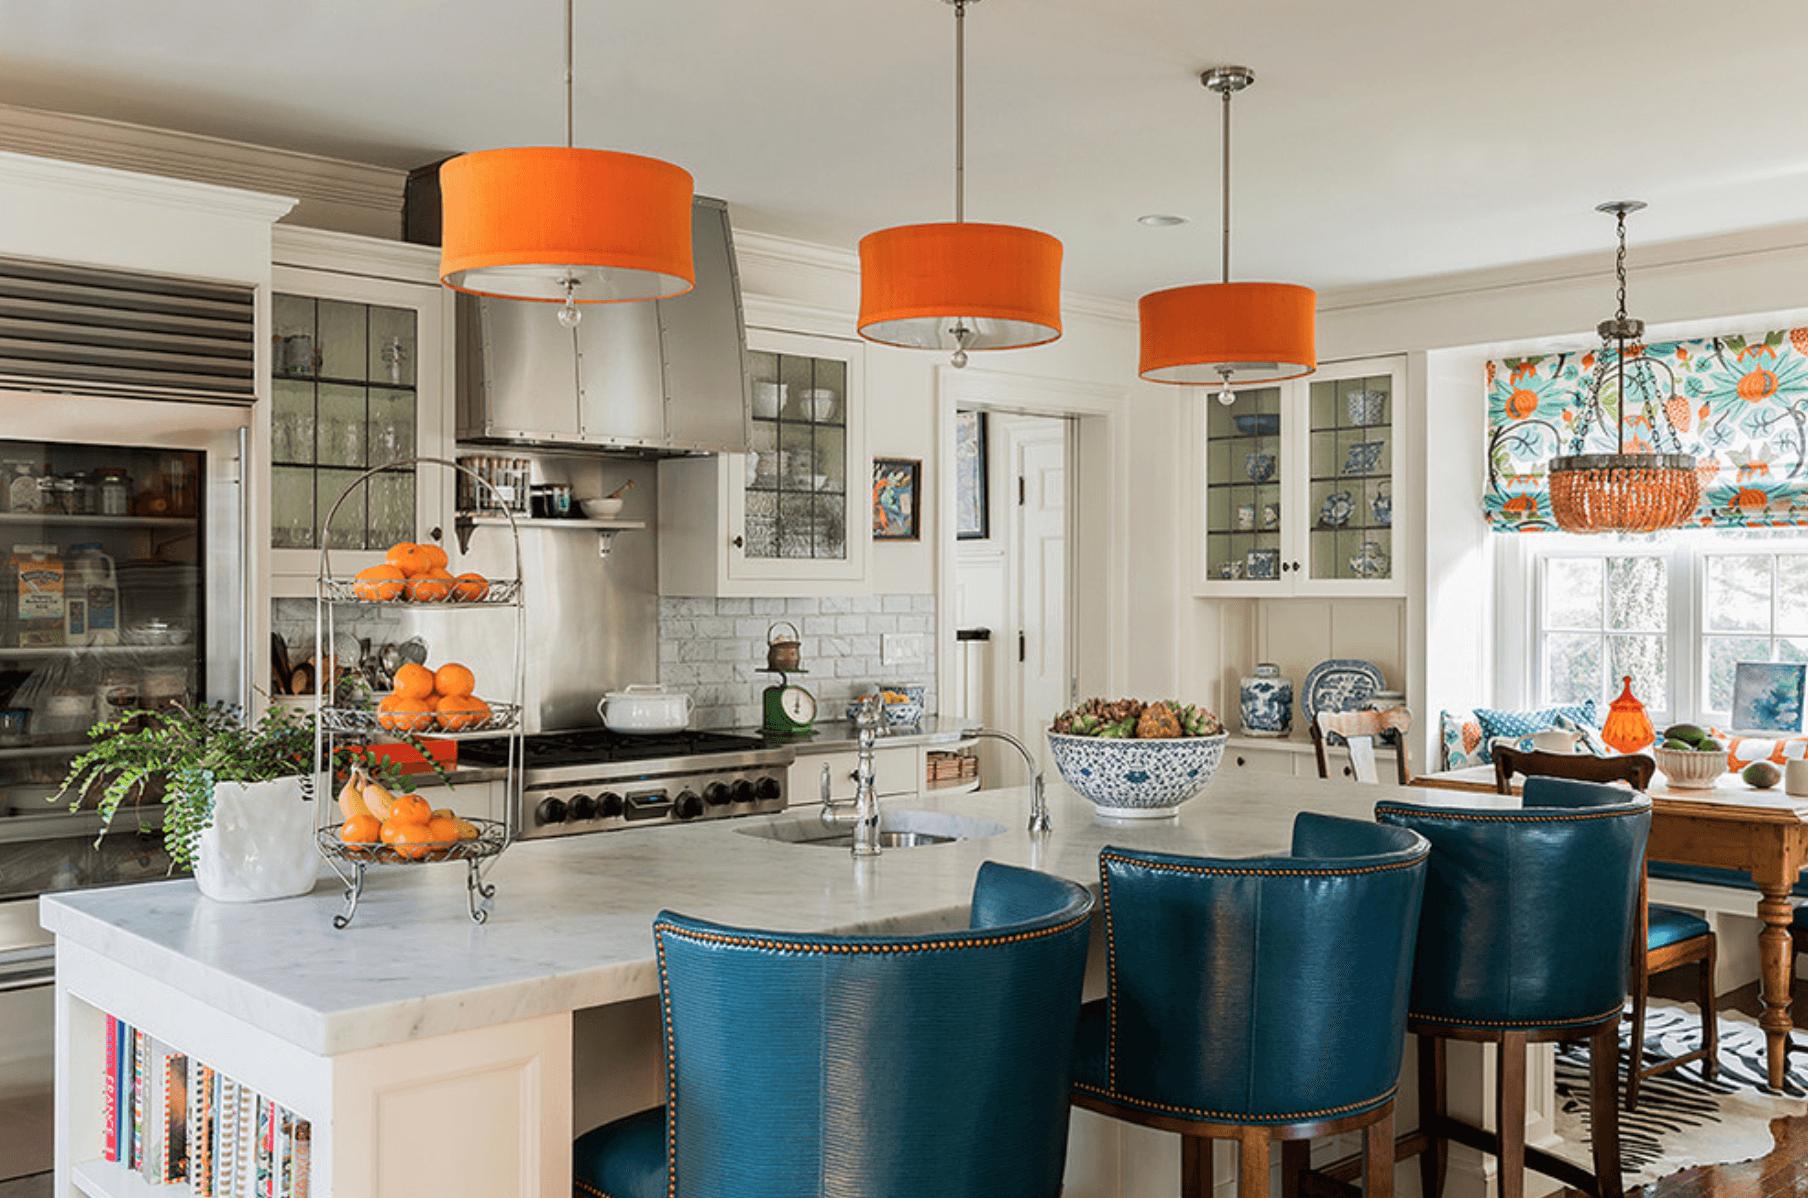 кухня с оранжево и синьо_1